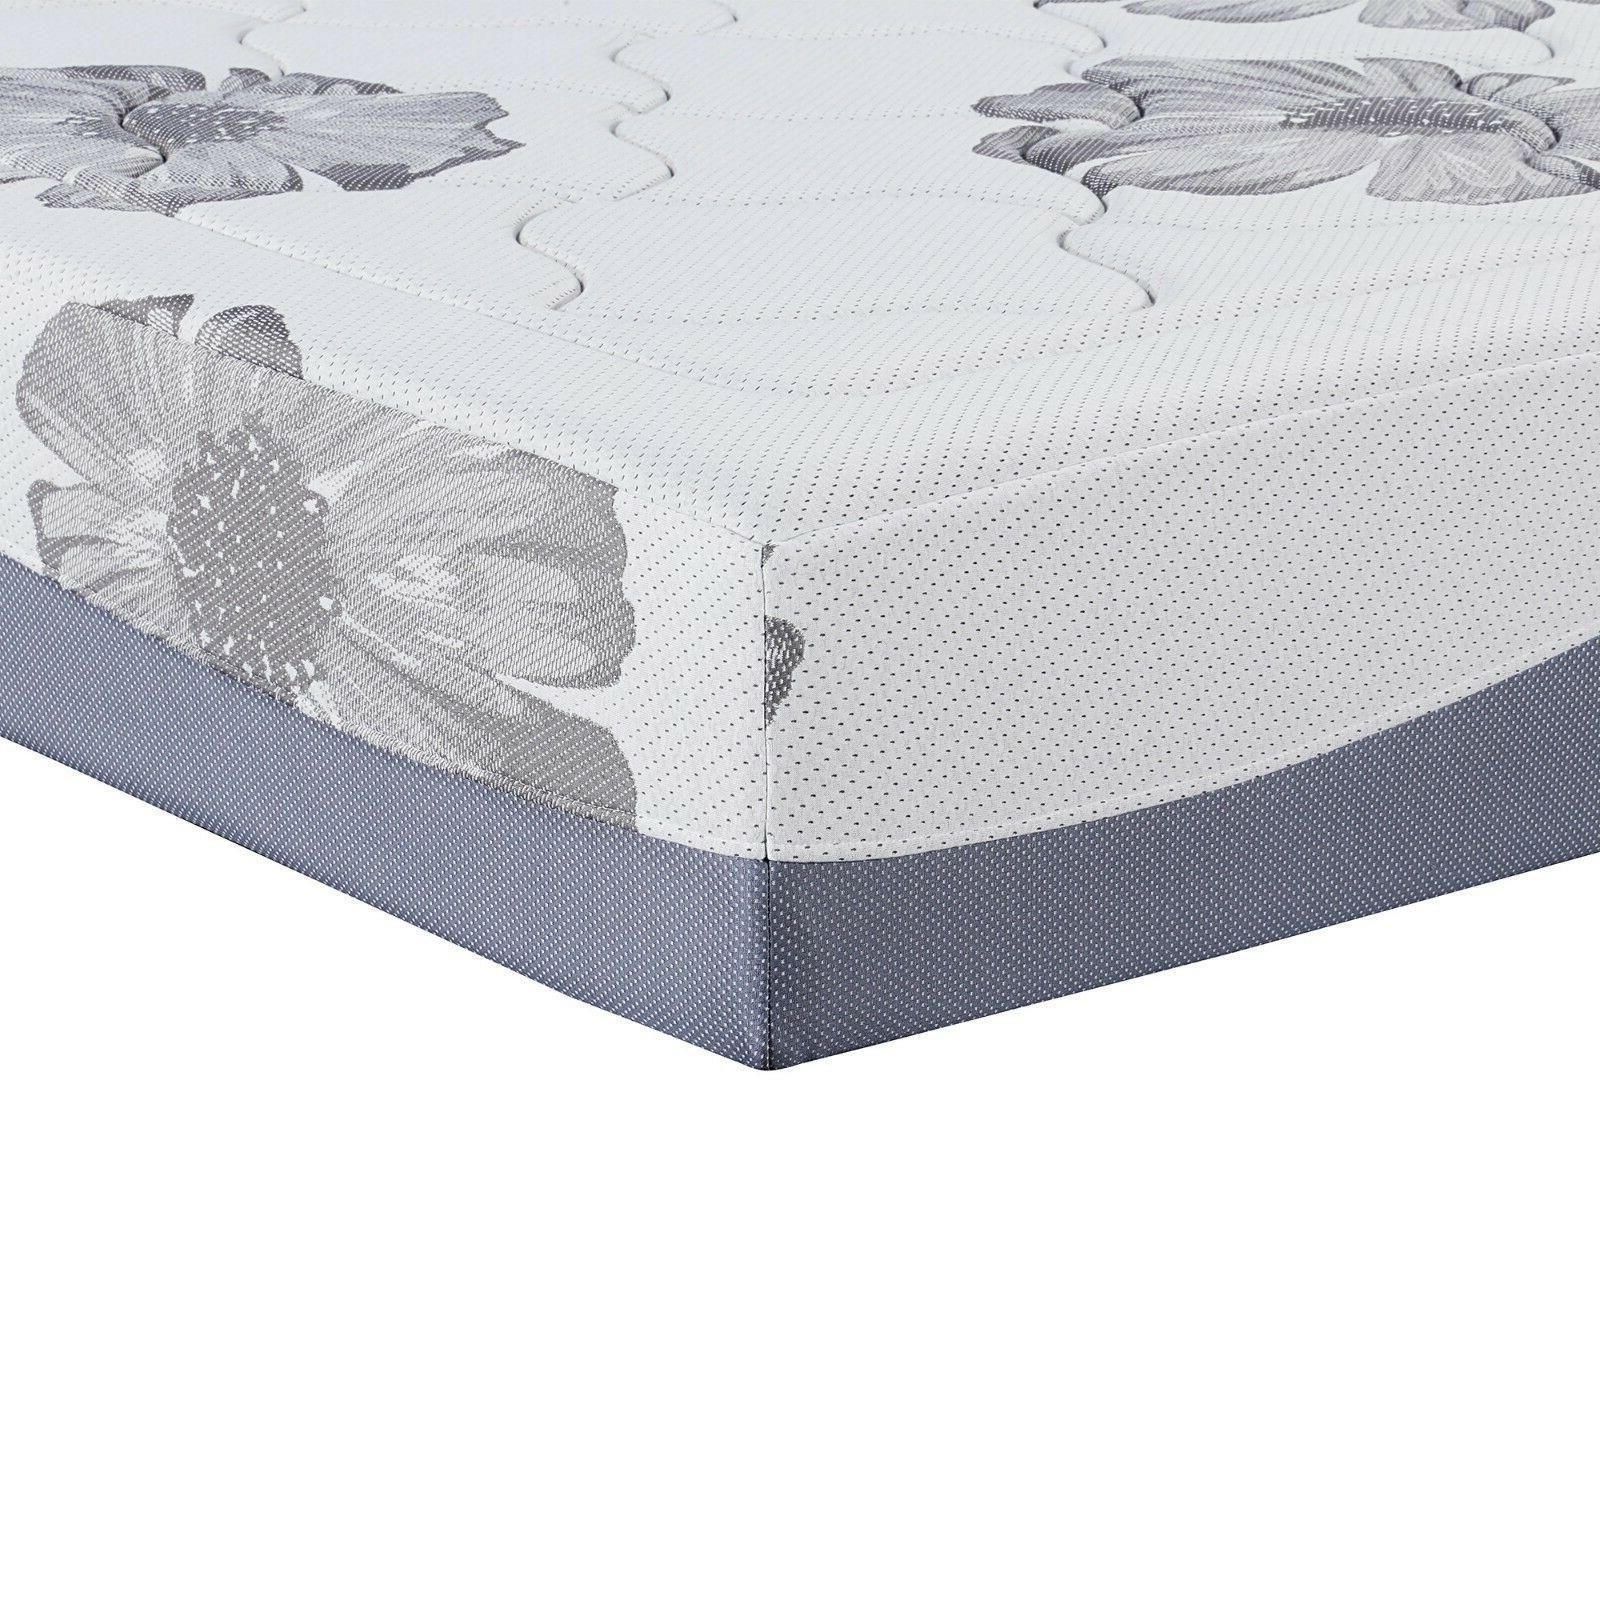 SLEEPLACE 12 I Gel Foam Mattress, Bedroom, Bed